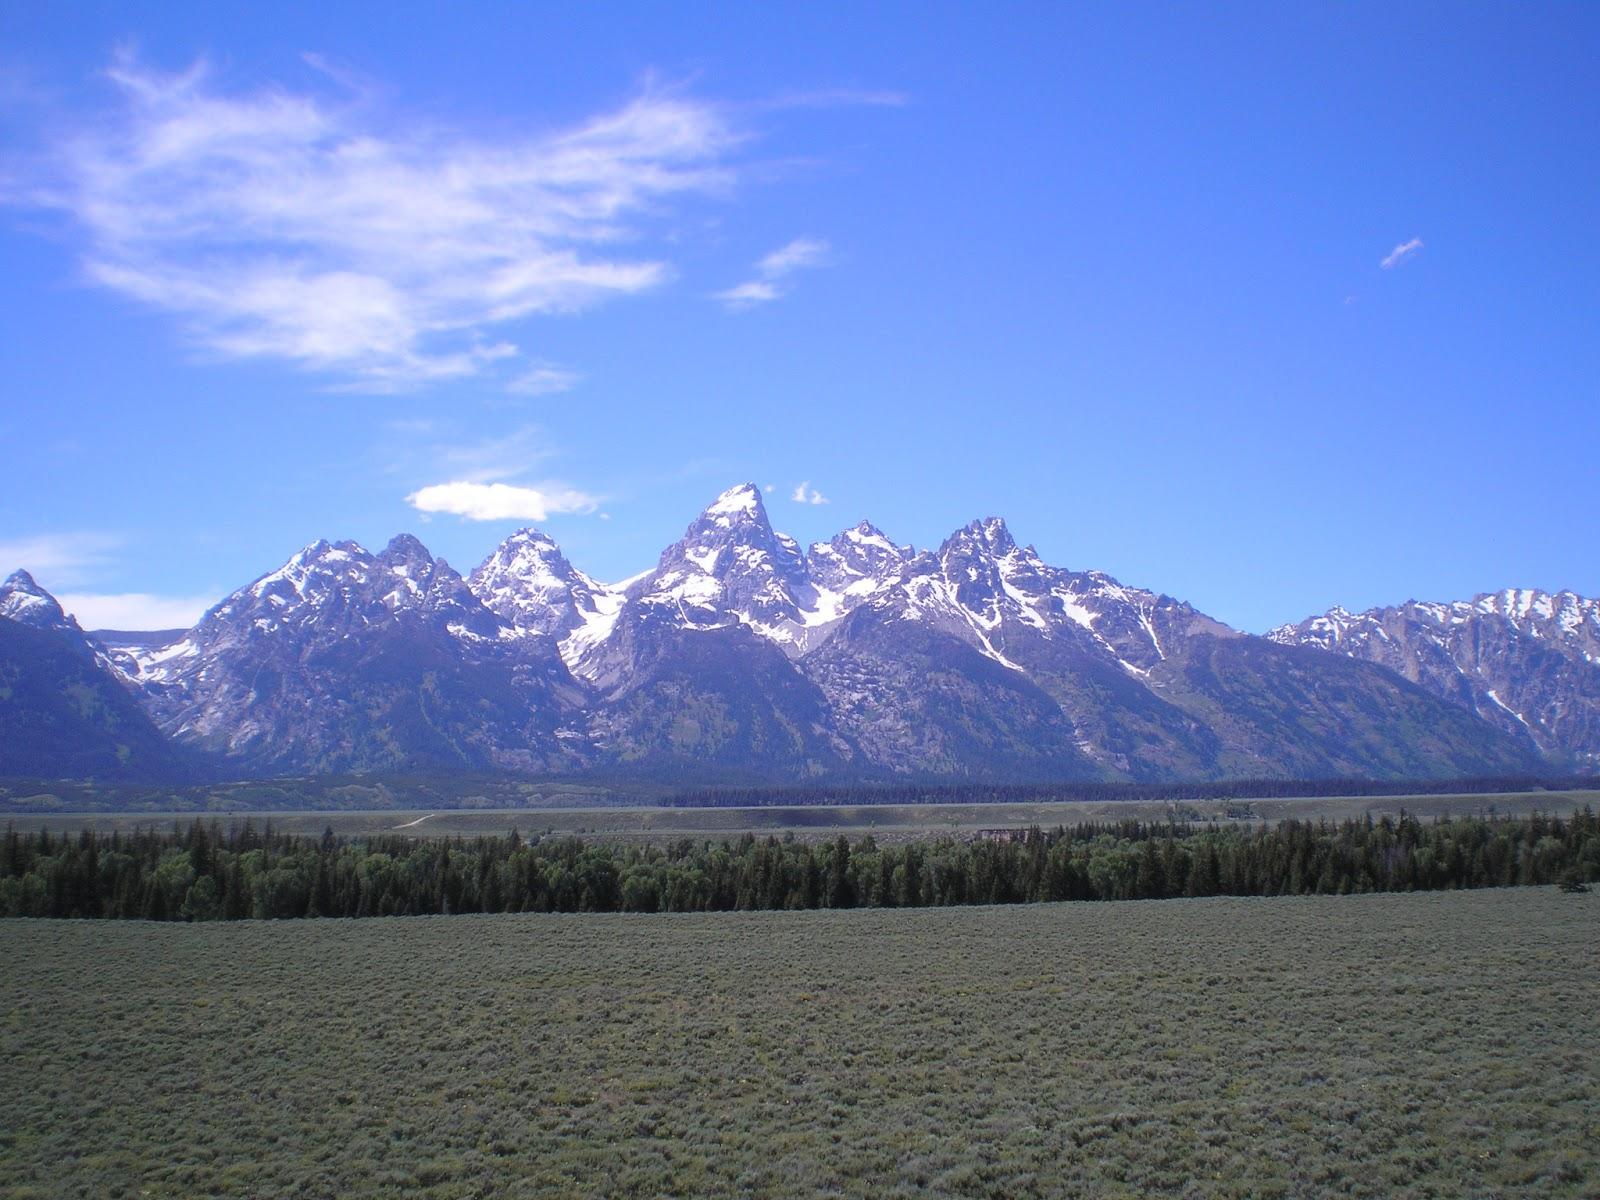 The Road Genealogist Grand Teton National Park Wyoming